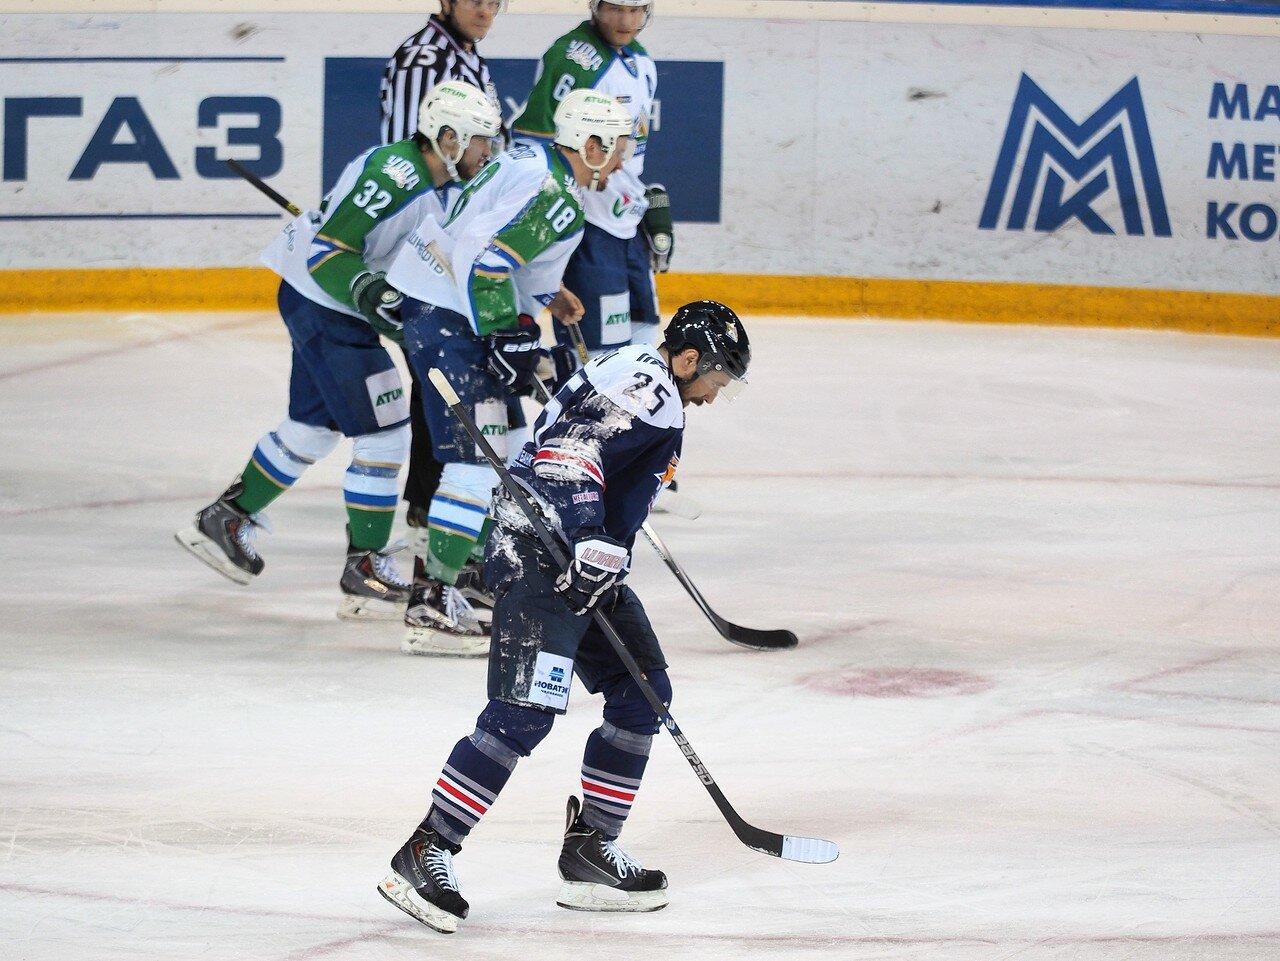 126Плей-офф 2016 Восток Финал Металлург - Салават Юлаев 23.03.2016